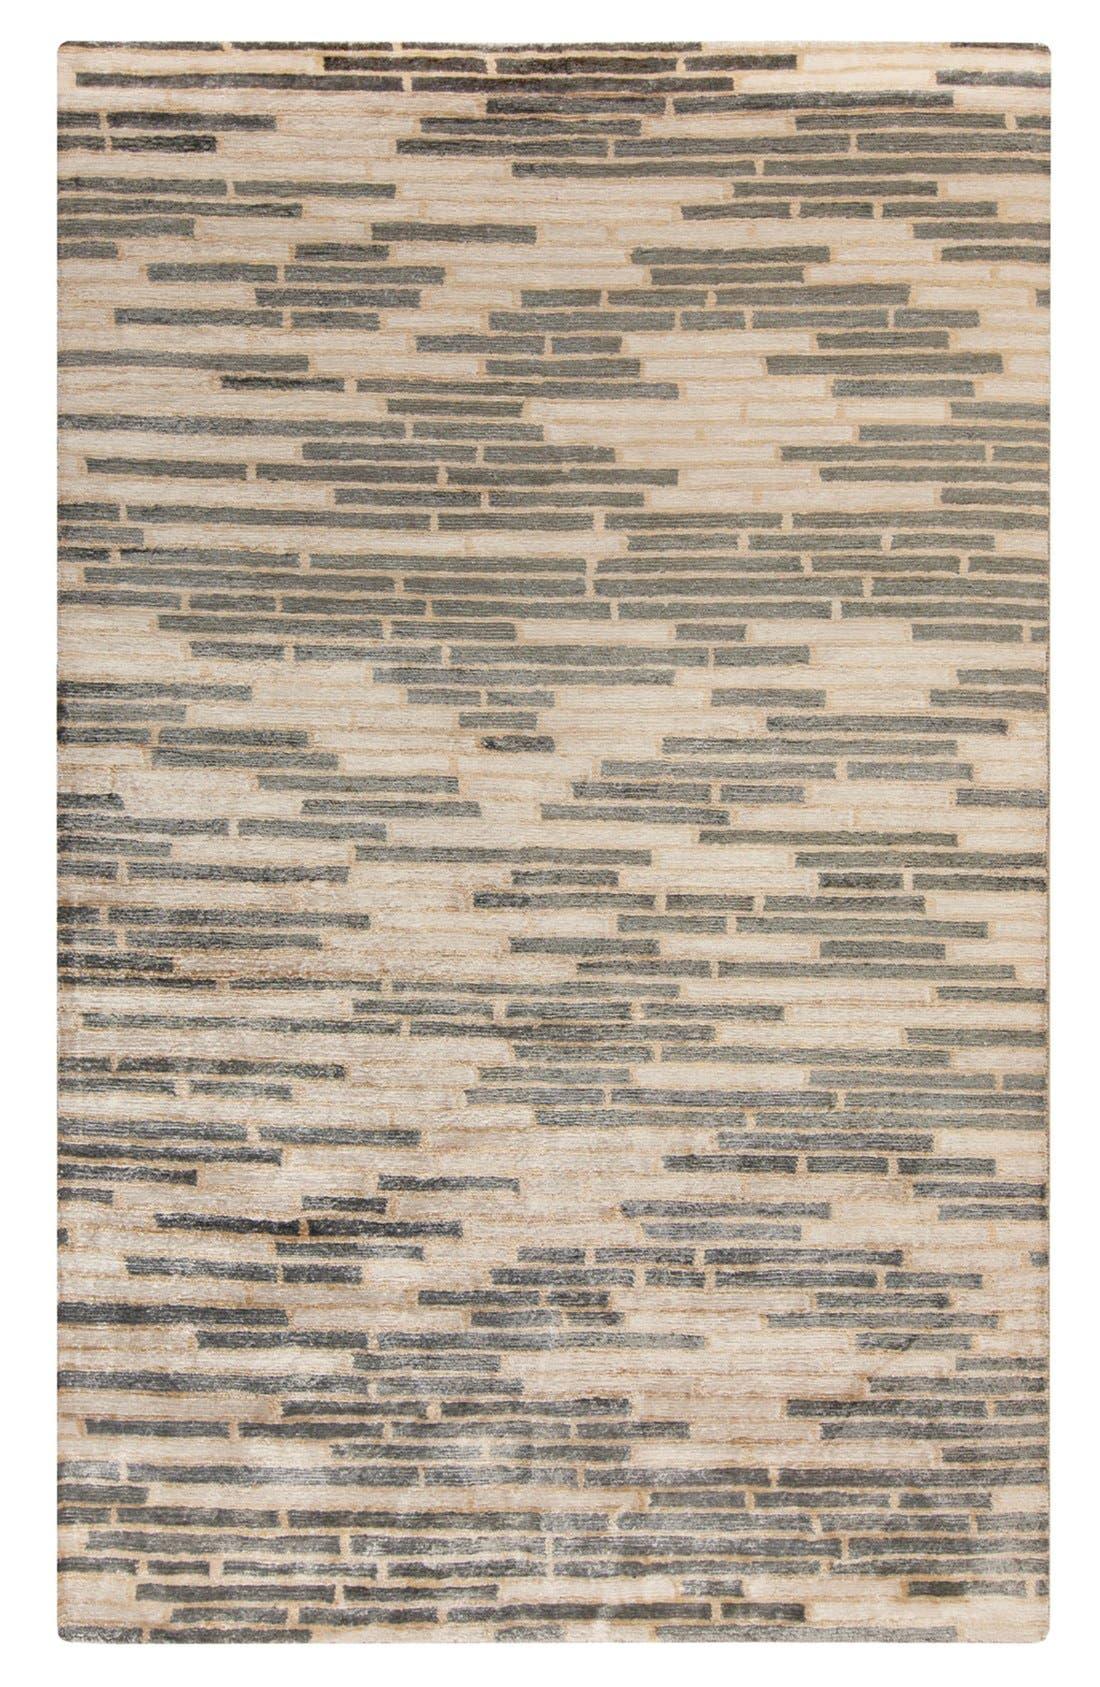 'Platinum' Hand Tufted Rug,                         Main,                         color, CHARCOAL/ BEIGE/ IVORY